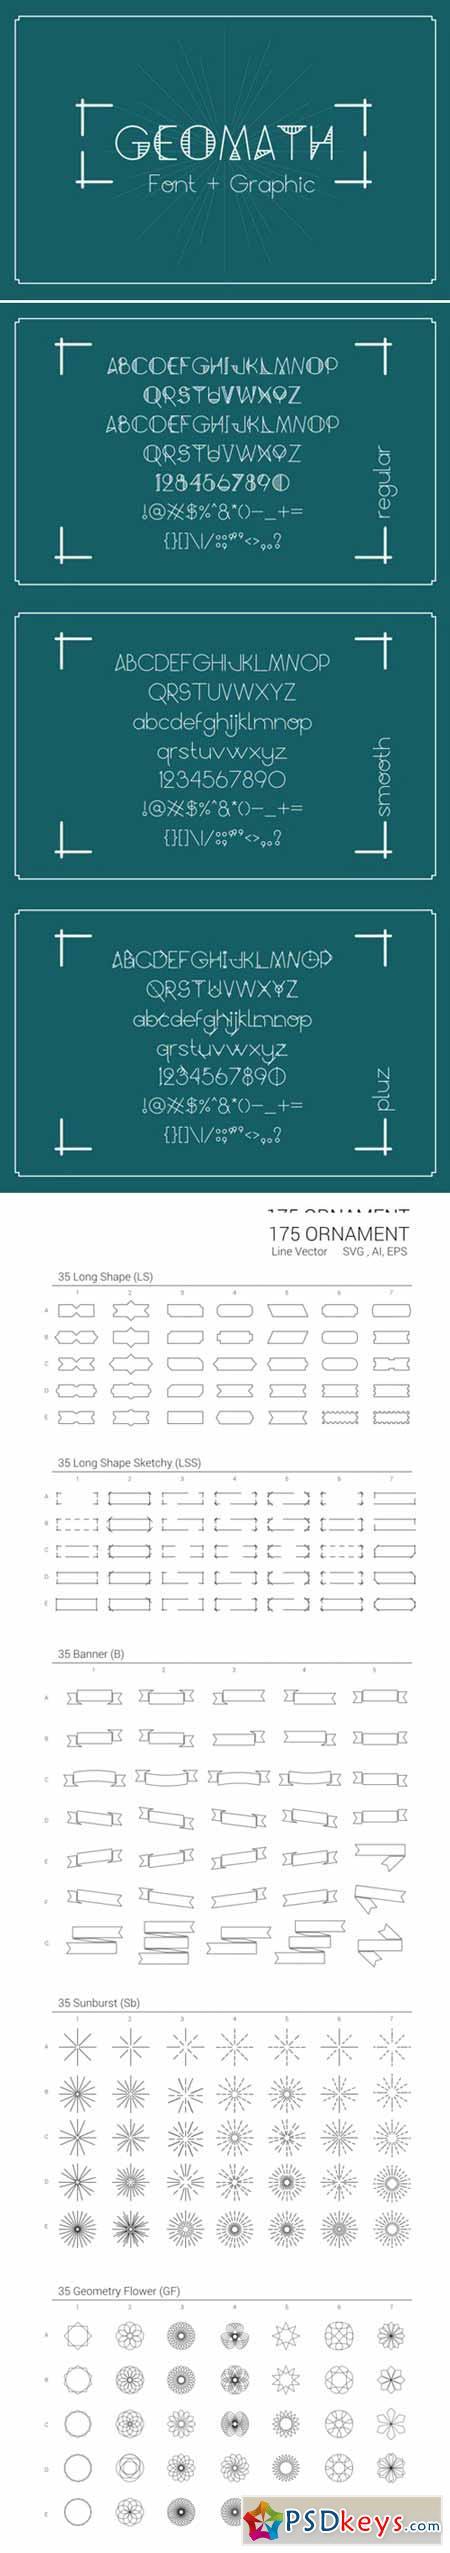 GeoMath - Font & Graphic 380503